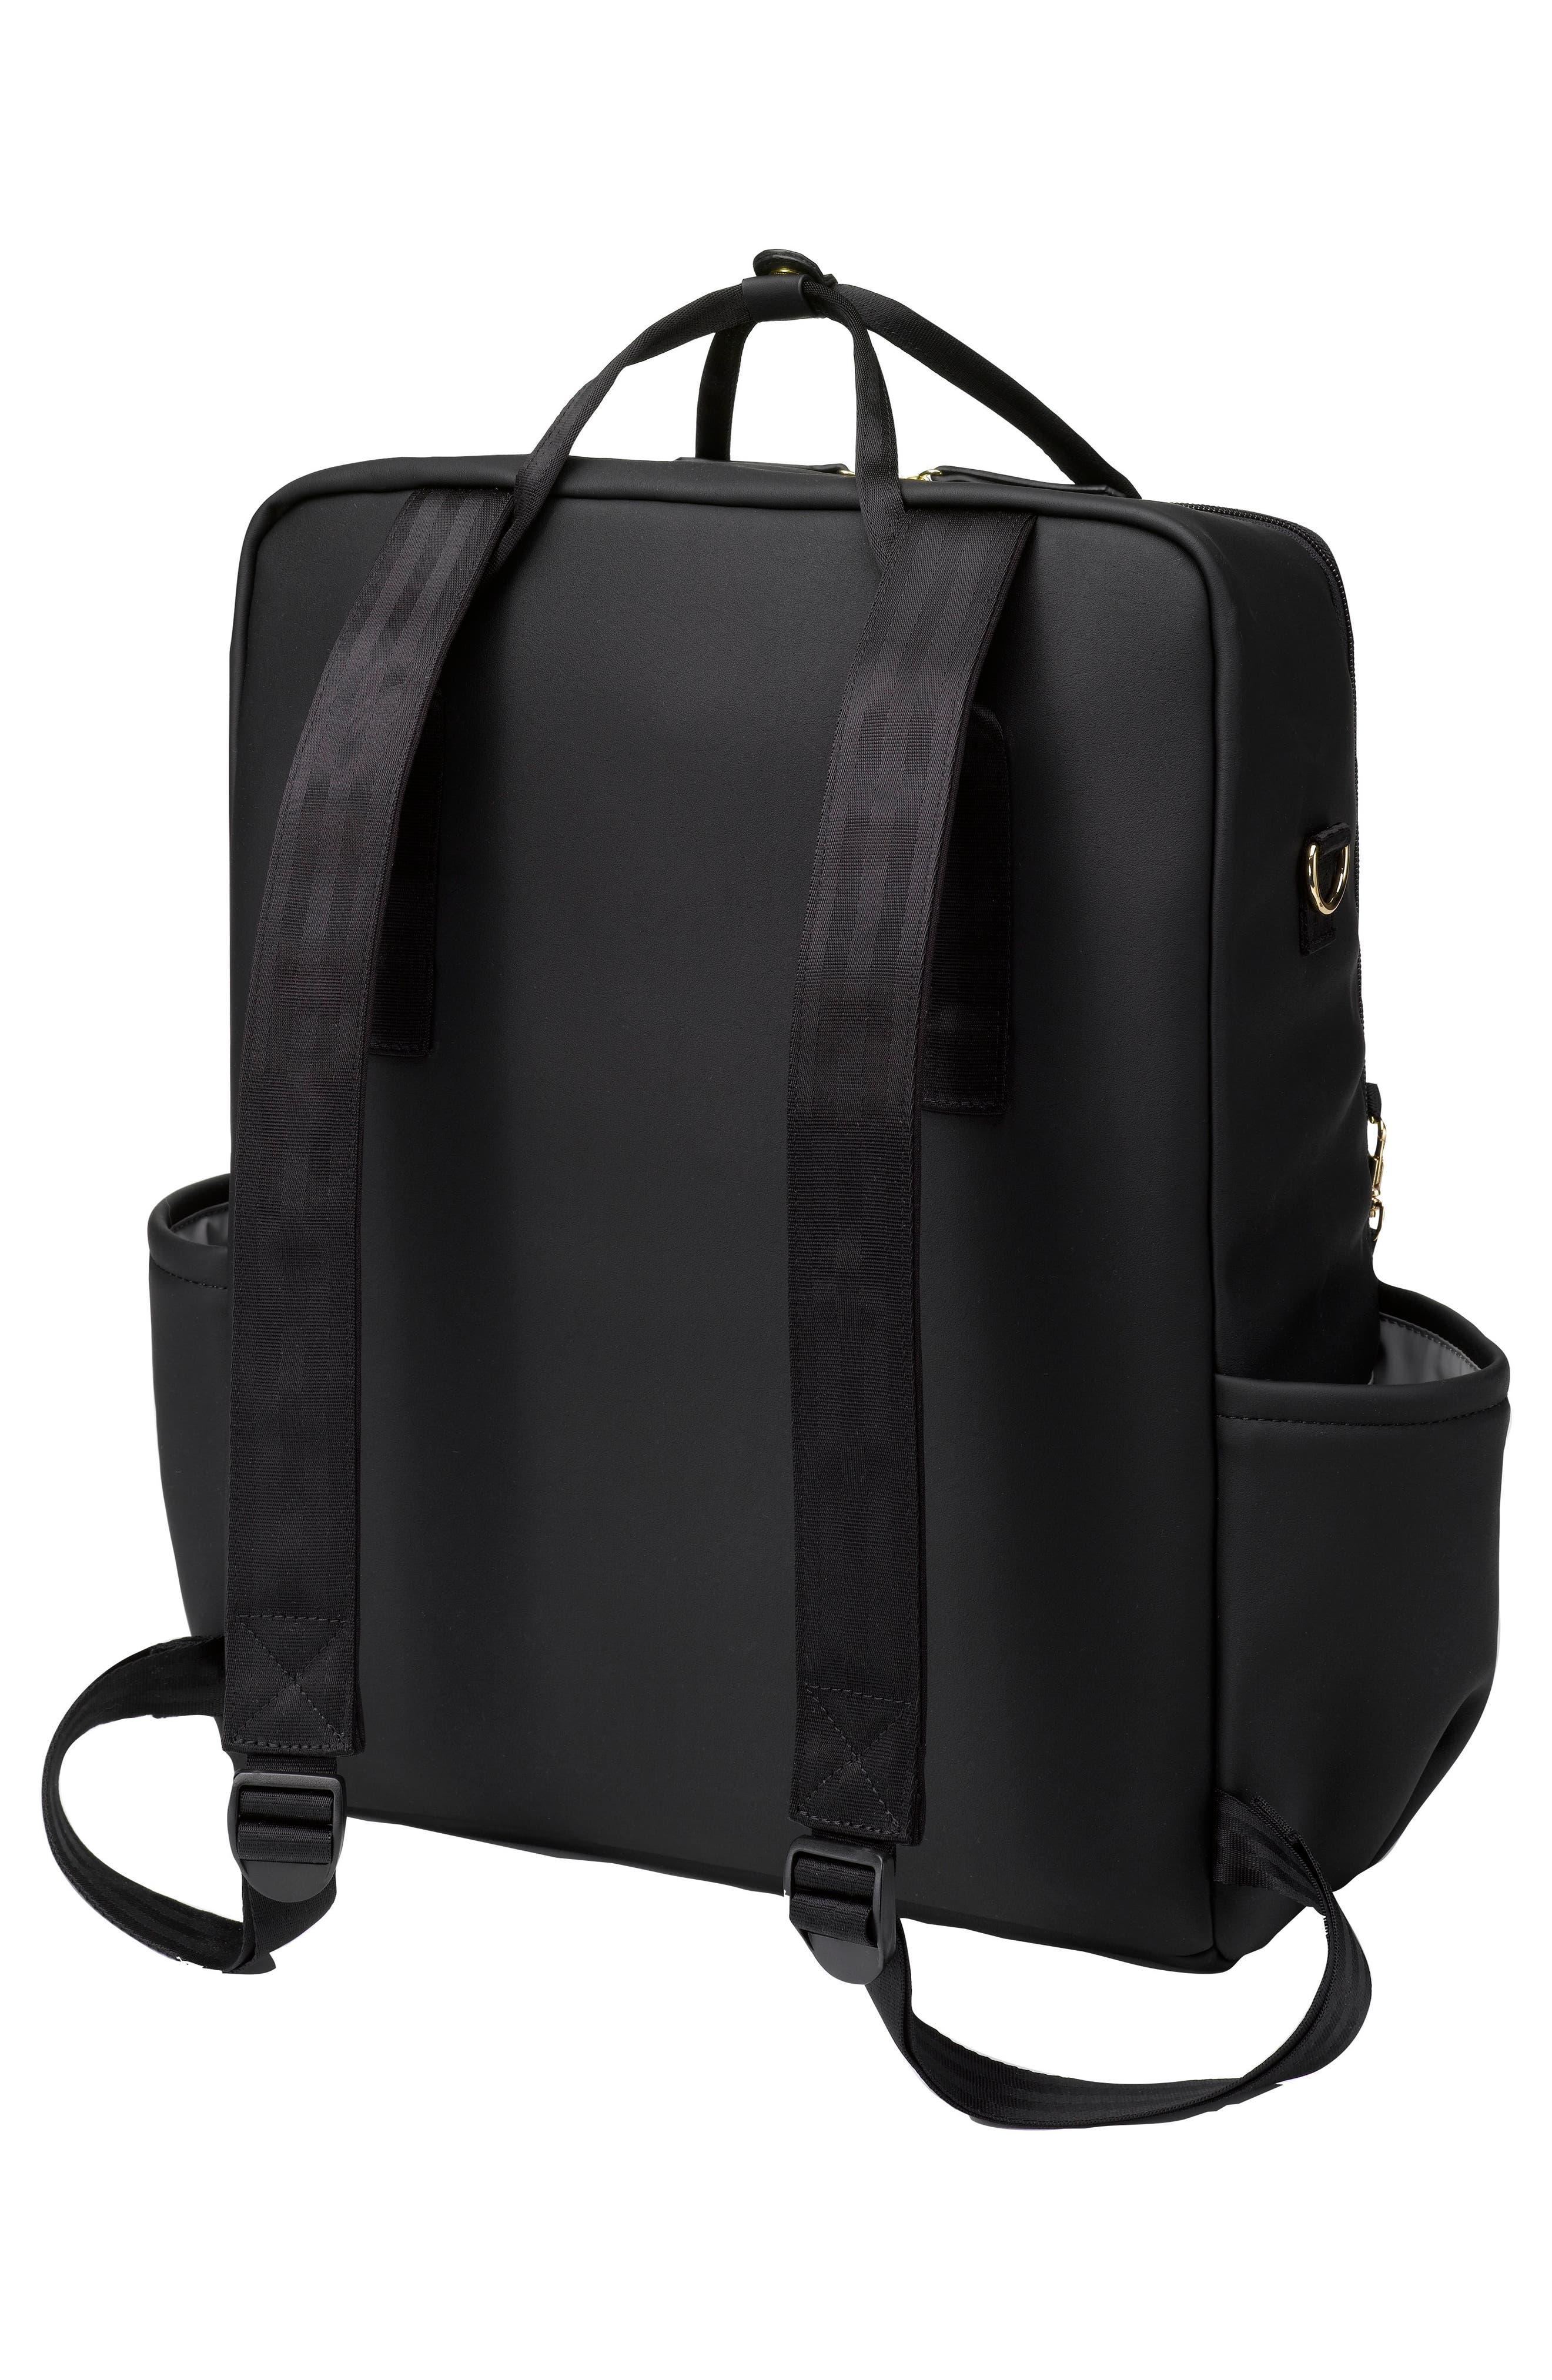 Balance Backpack Diaper Bag,                             Alternate thumbnail 3, color,                             Black Matte Leatherette